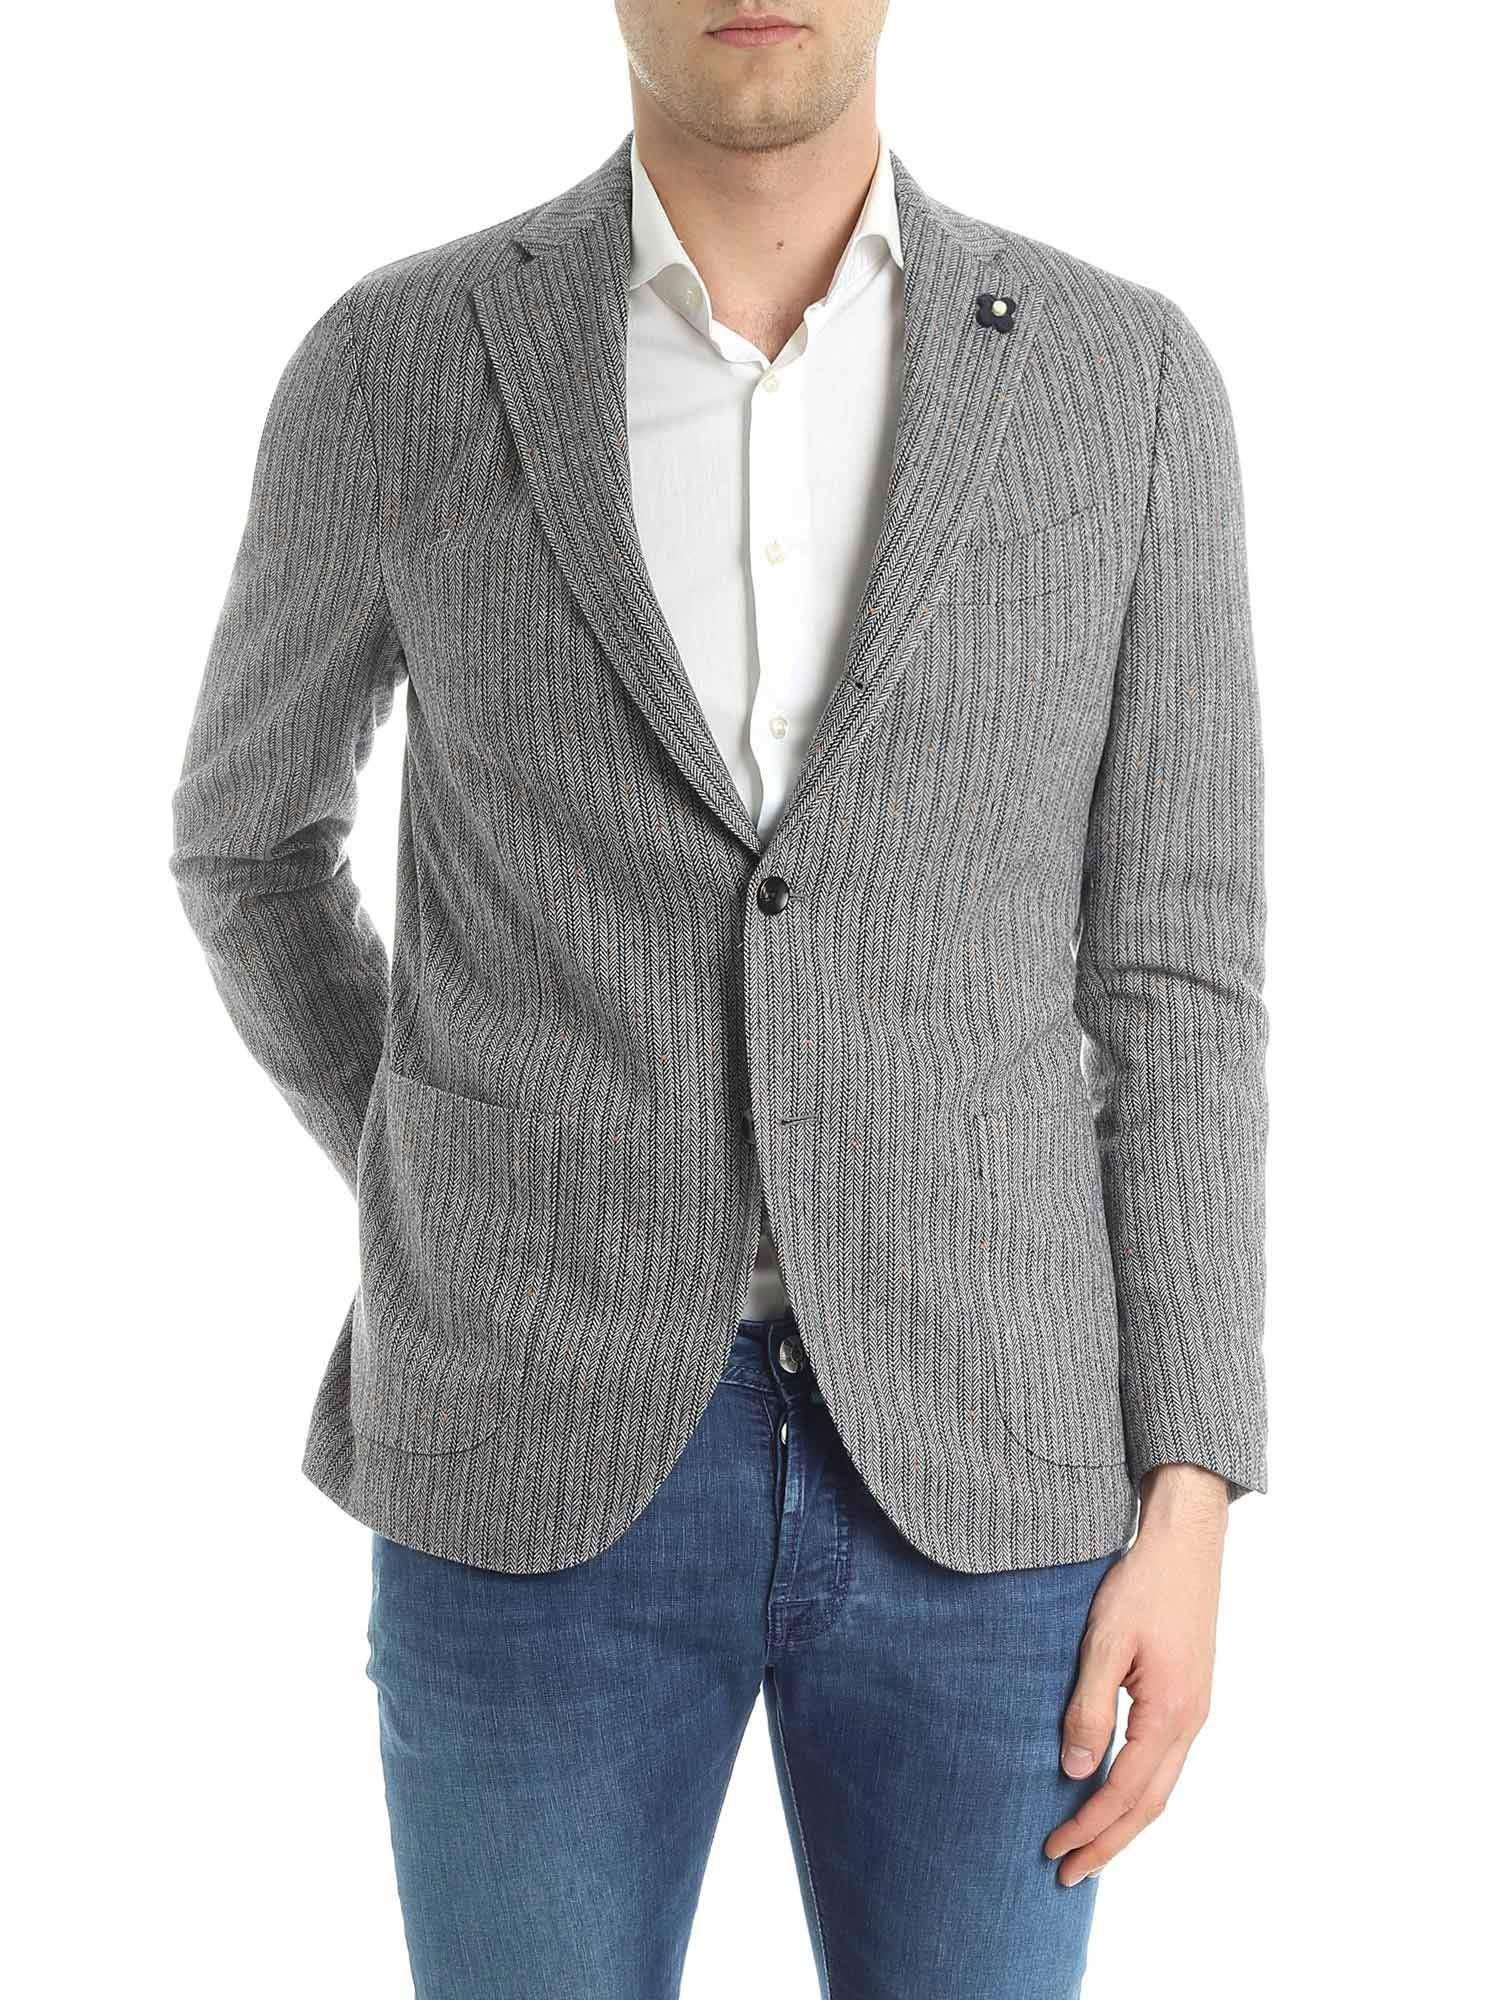 a4b3a4f54ae735 Lardini Gray Diagonal Fabric Jacket in Gray for Men - Lyst